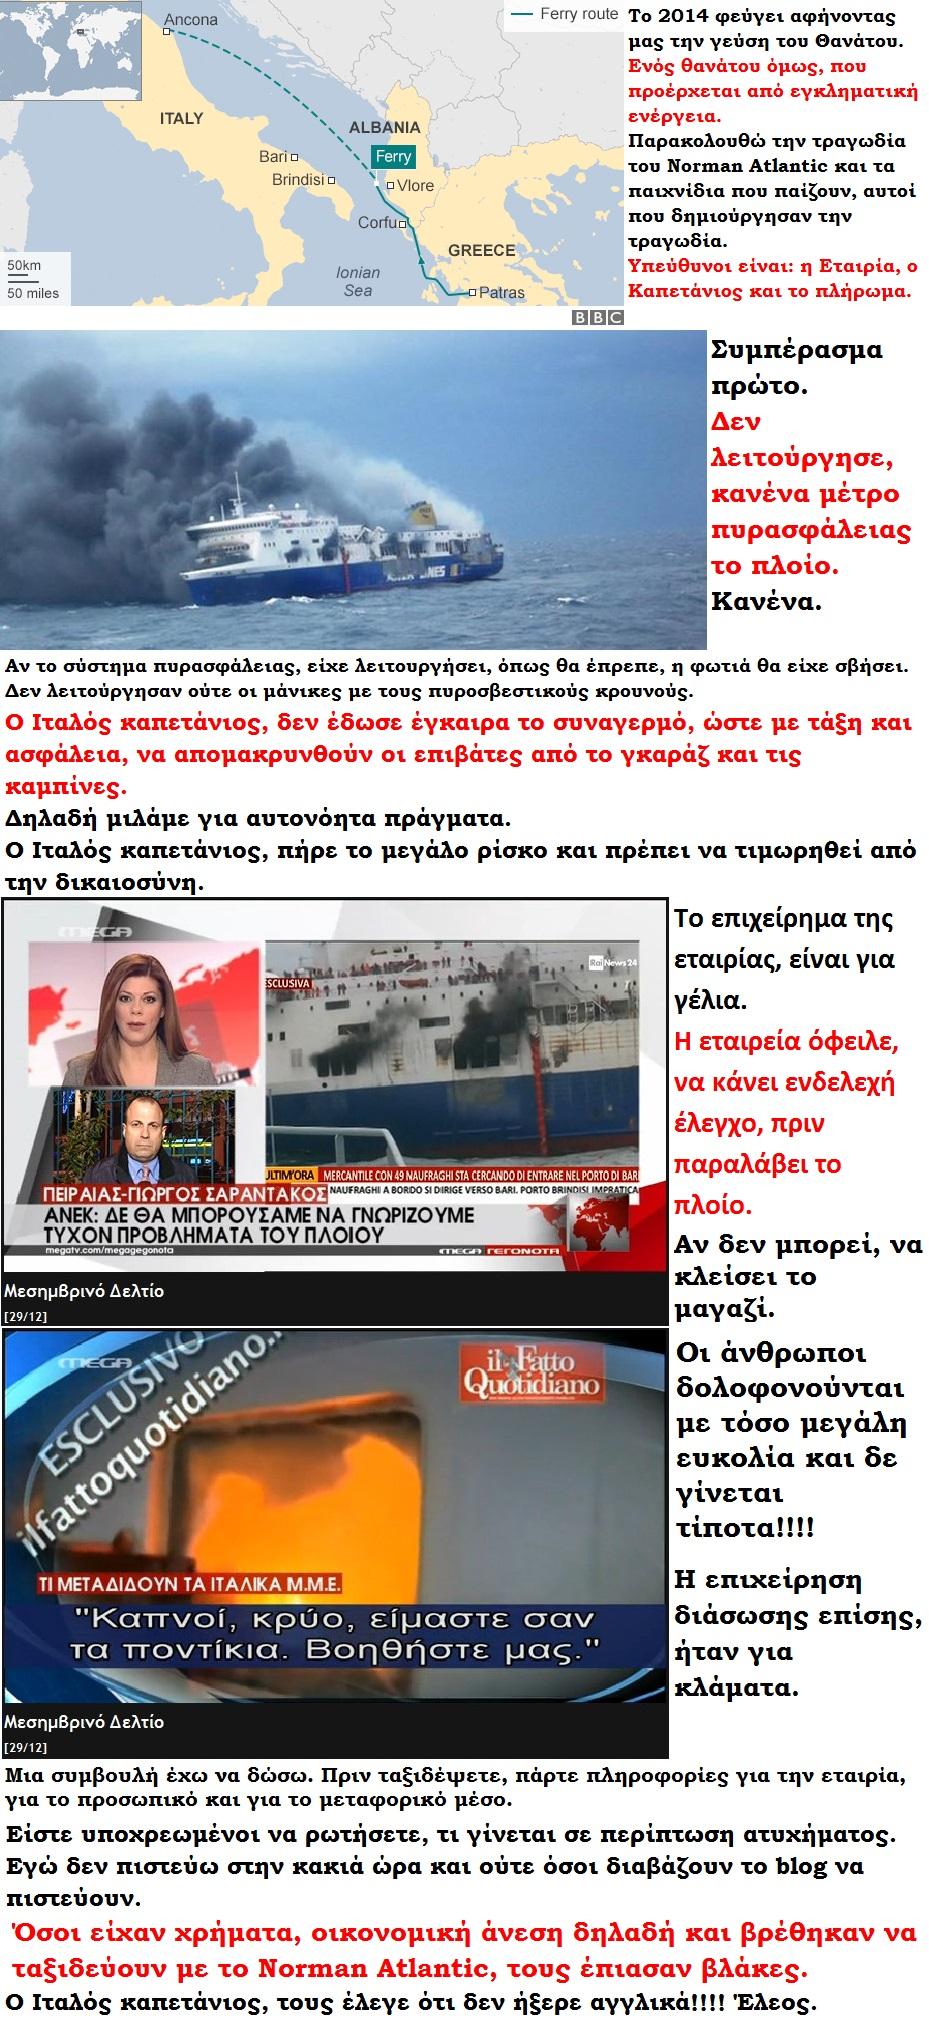 ELLADA NORMAN ATLANTIC FIRE FERRY SHIP MAP 01 311214